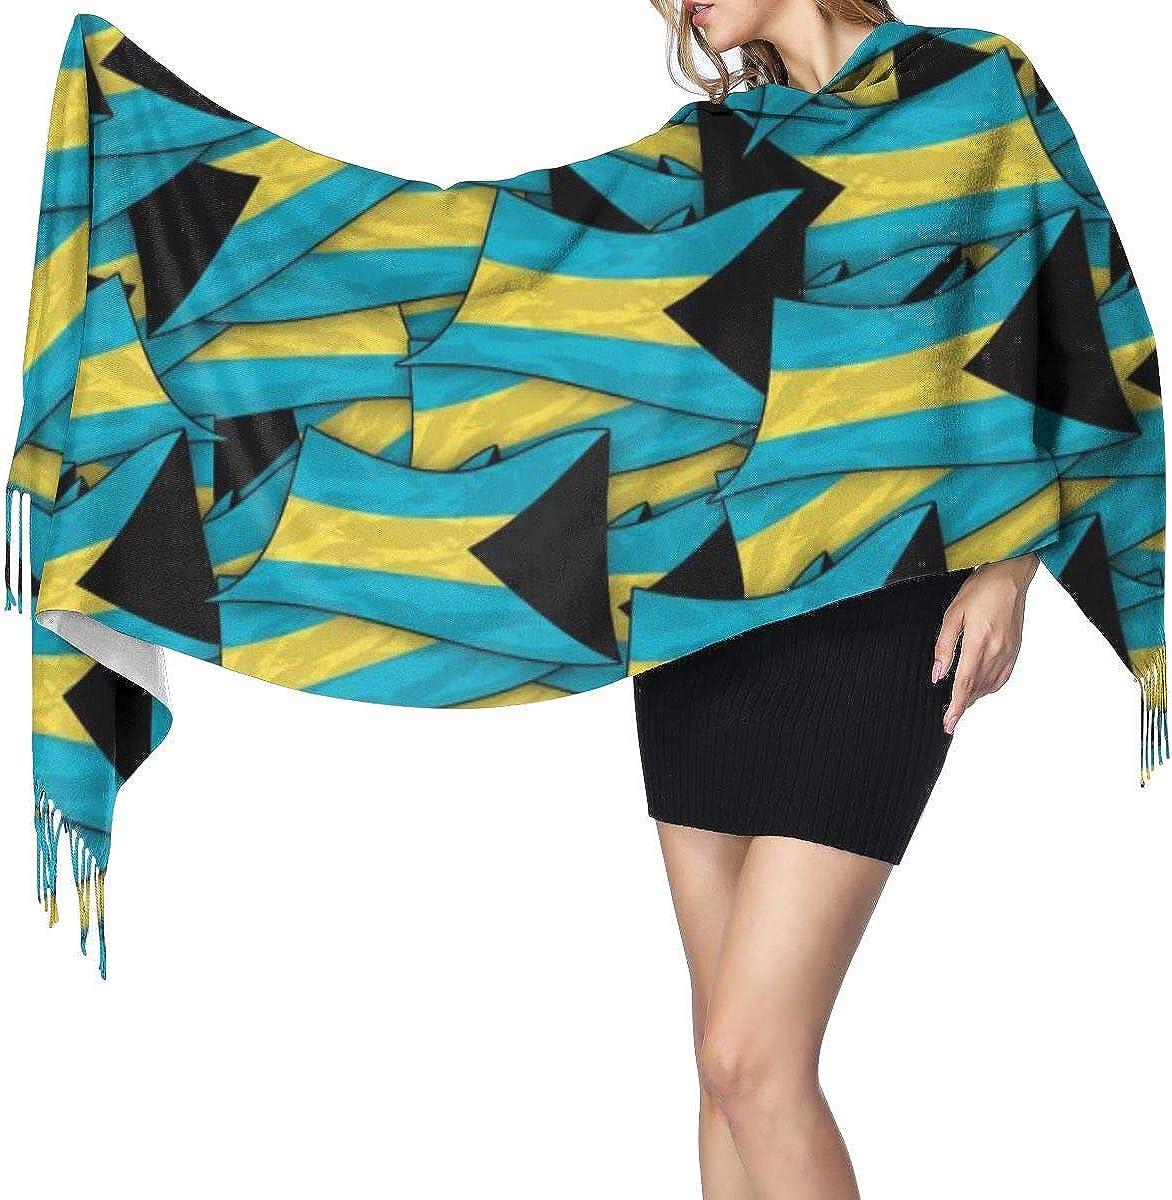 The Bahamas Flag Wave Collage Womens Winter Warm Scarf Fashion Long Large Soft Cashmere Shawl Wrap Scarves